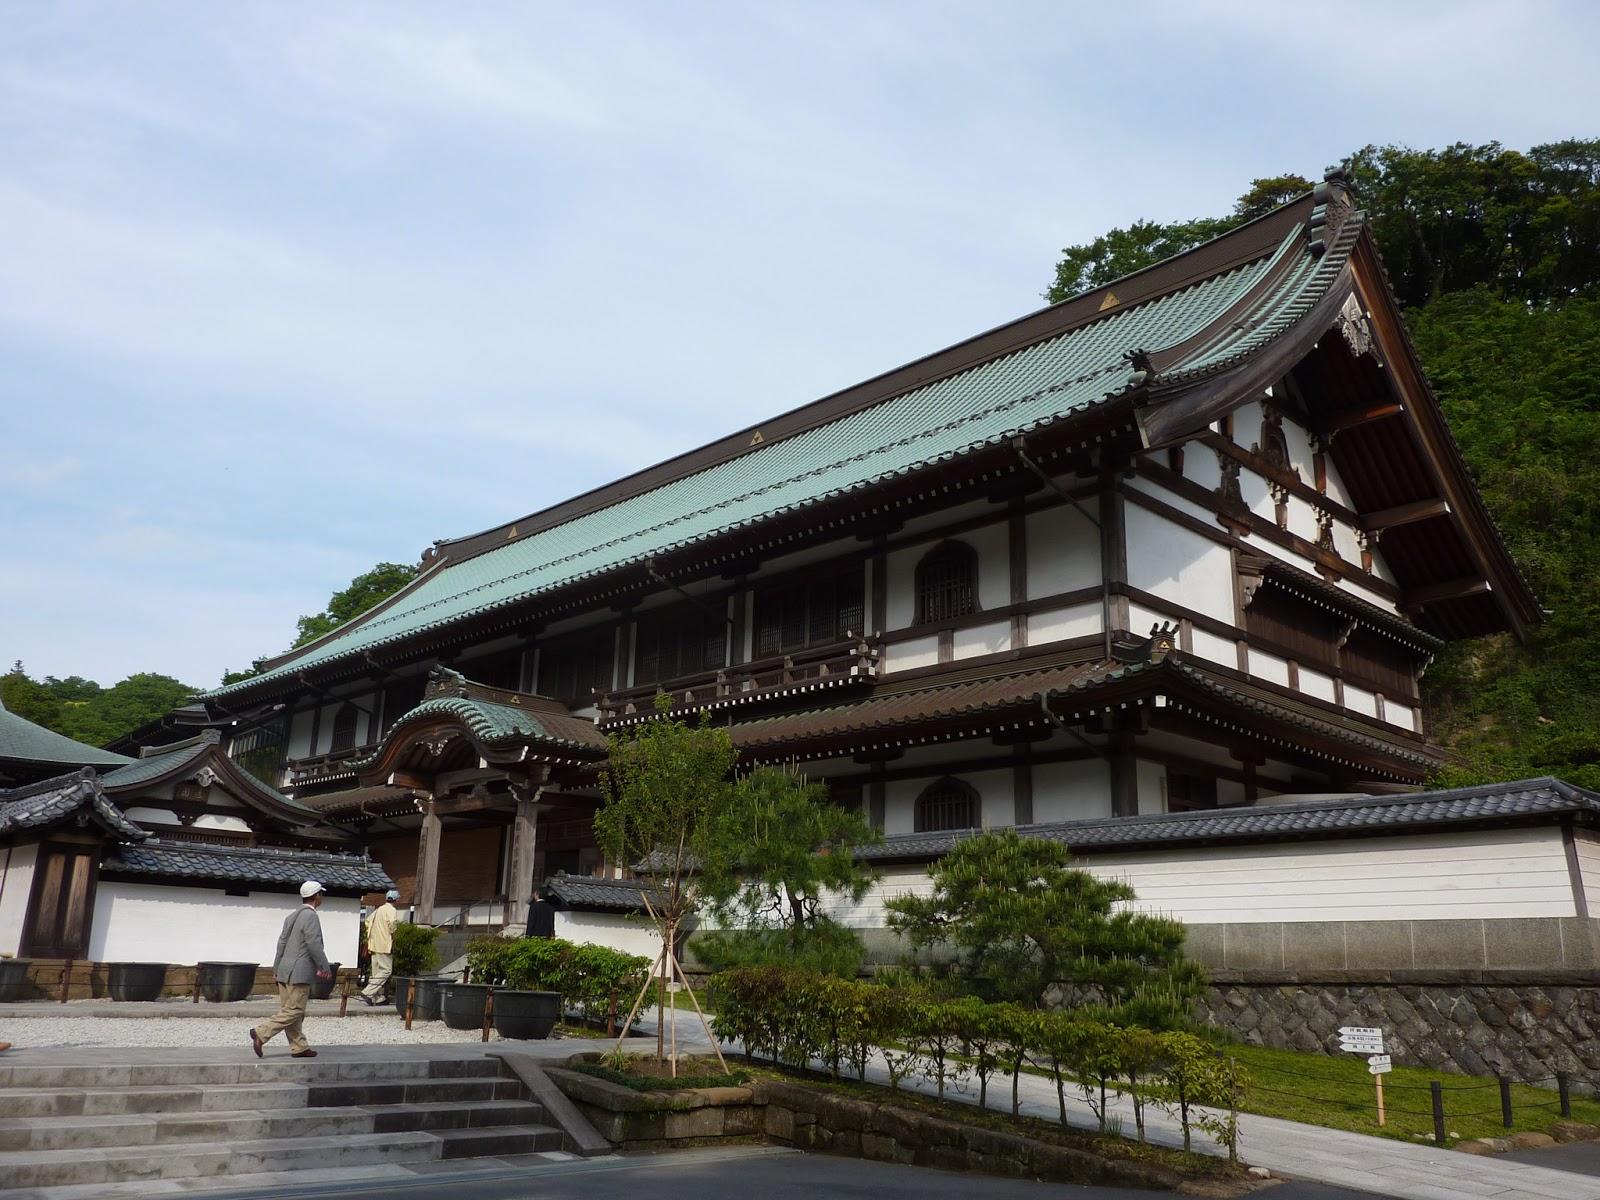 The Hazel Files: Kawara: Japanese Roof Tiles